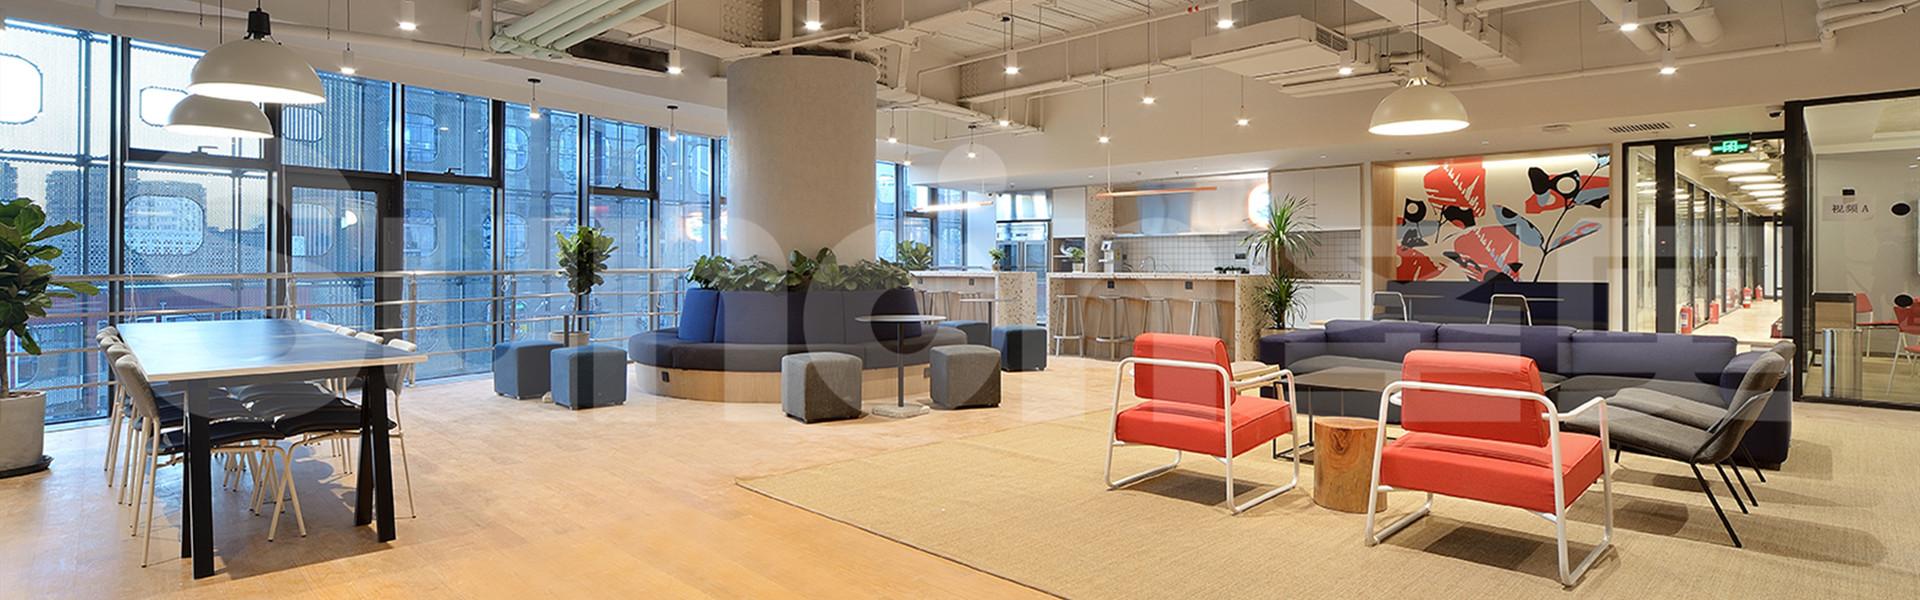 WeWork休闲空间 圣奥办公家具设计